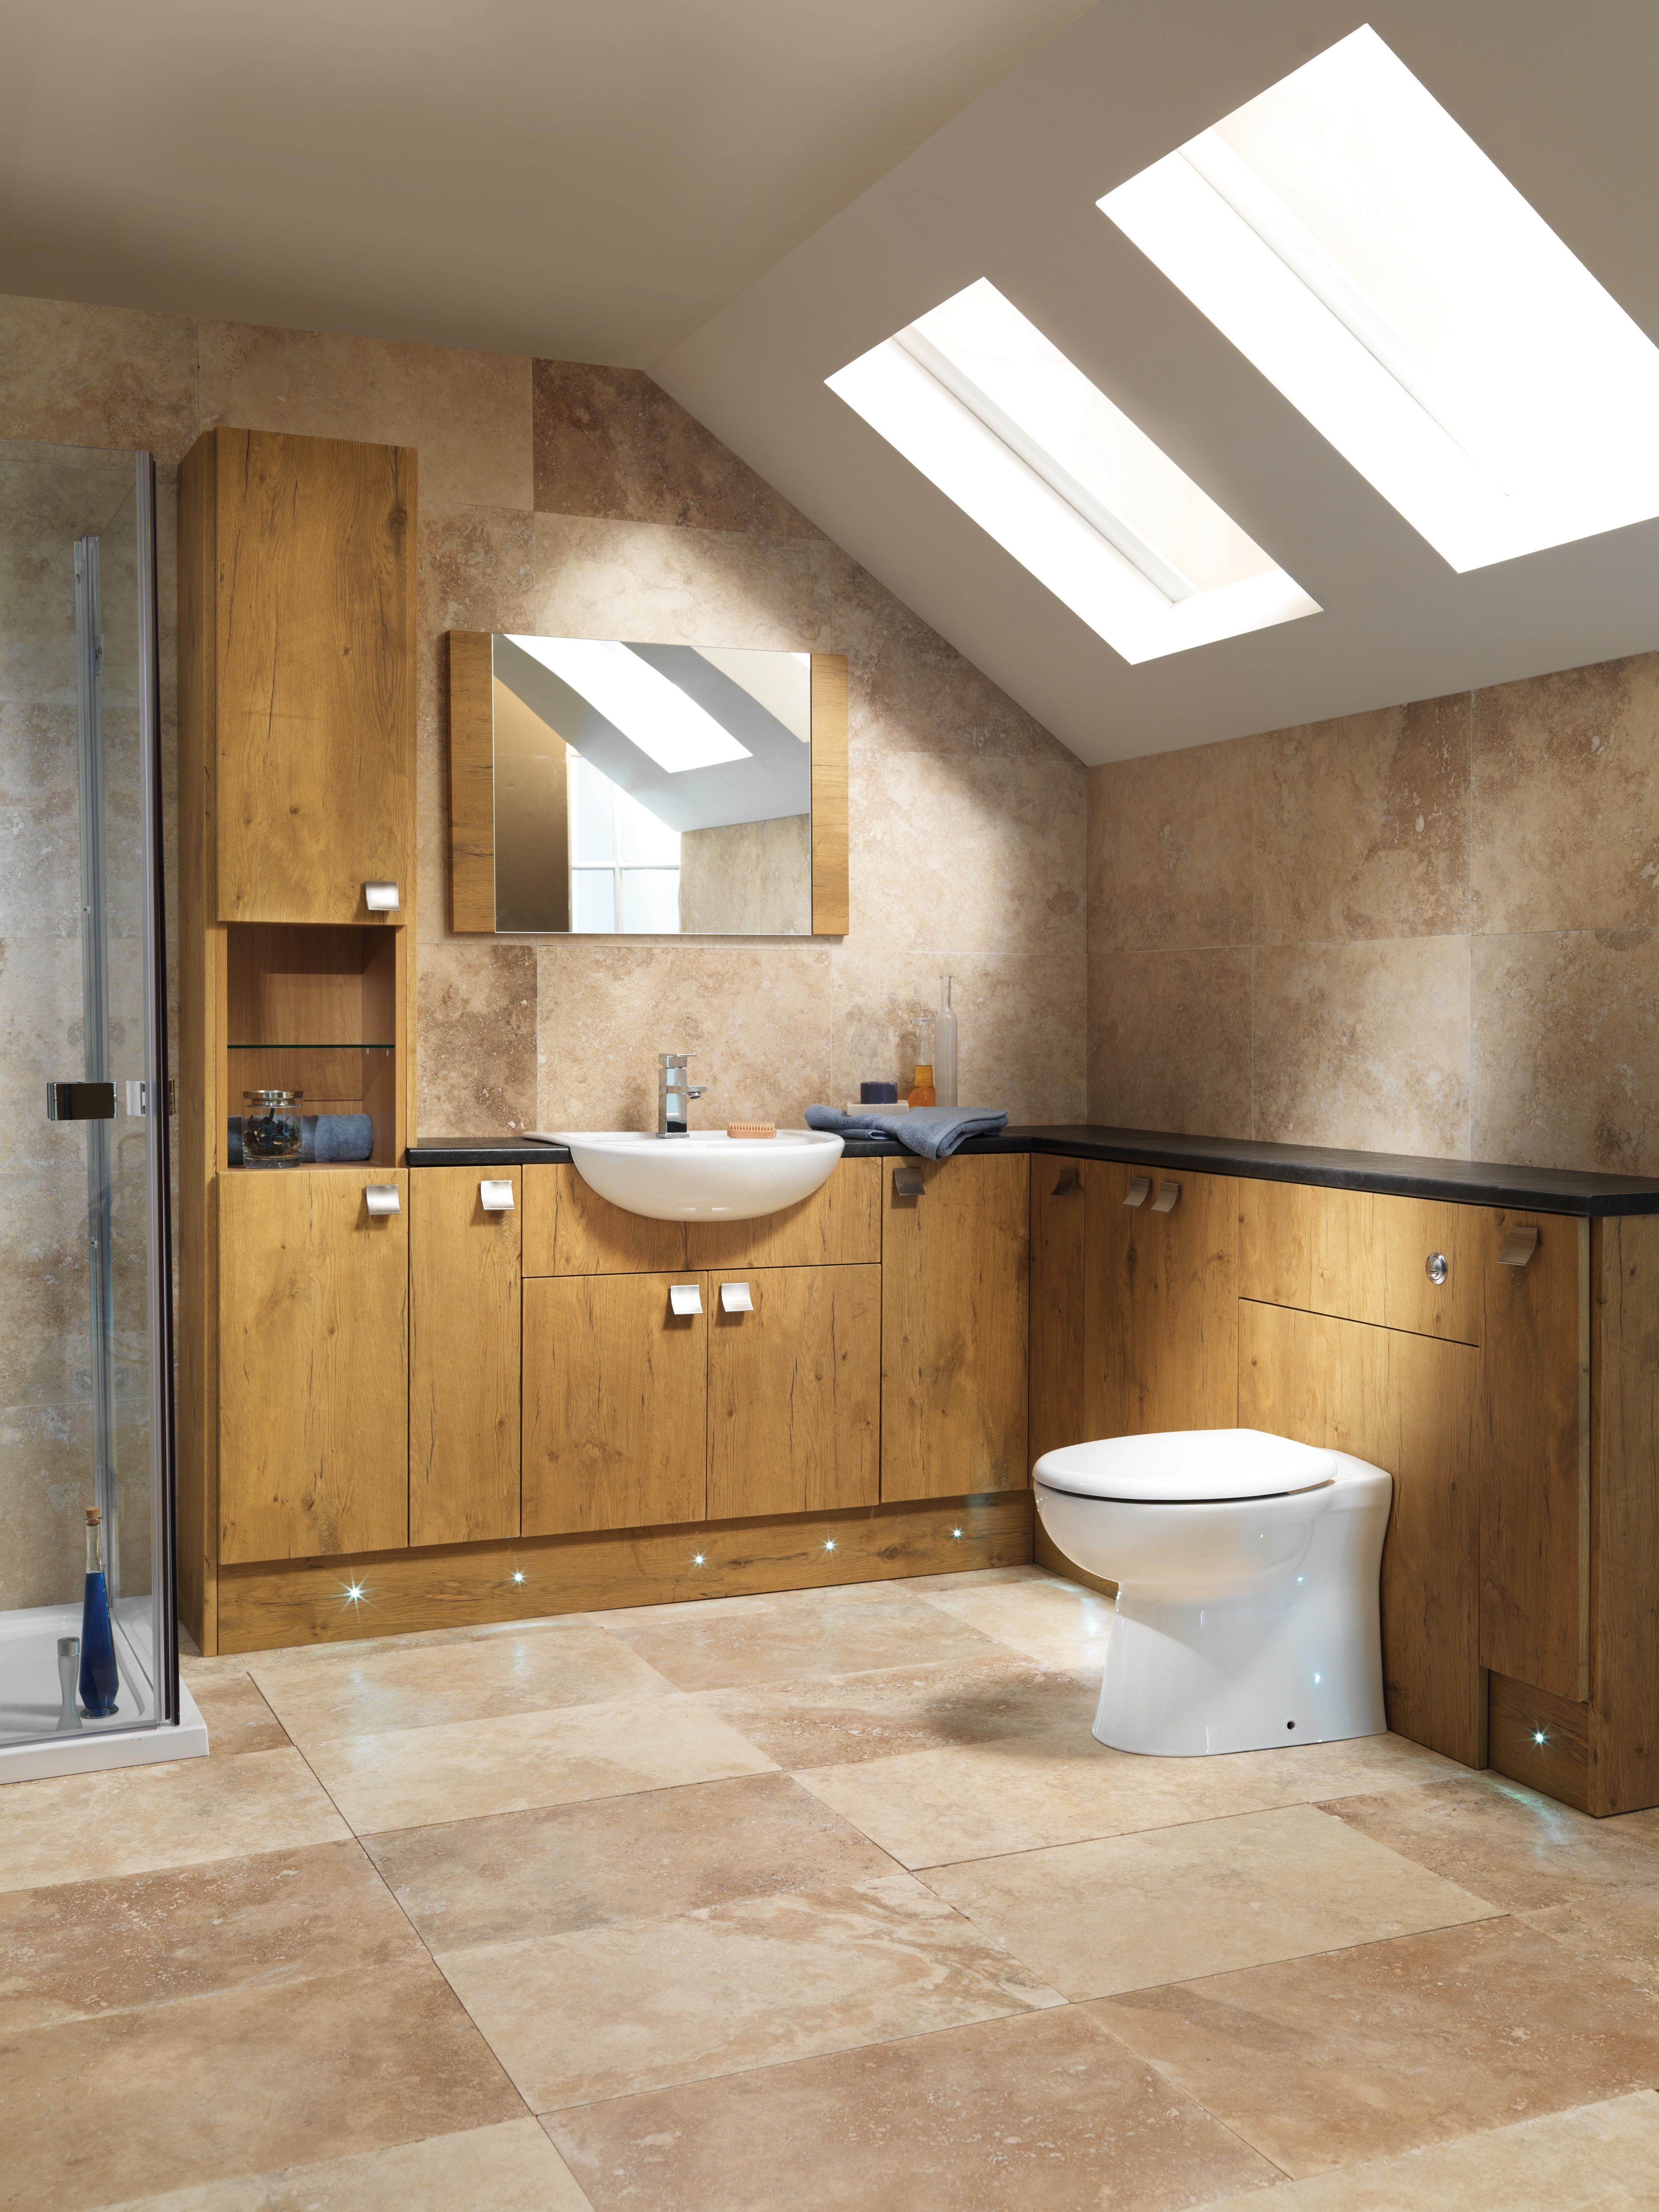 brecon farmhouse 2 ipswich bathroom and tile centre. Black Bedroom Furniture Sets. Home Design Ideas